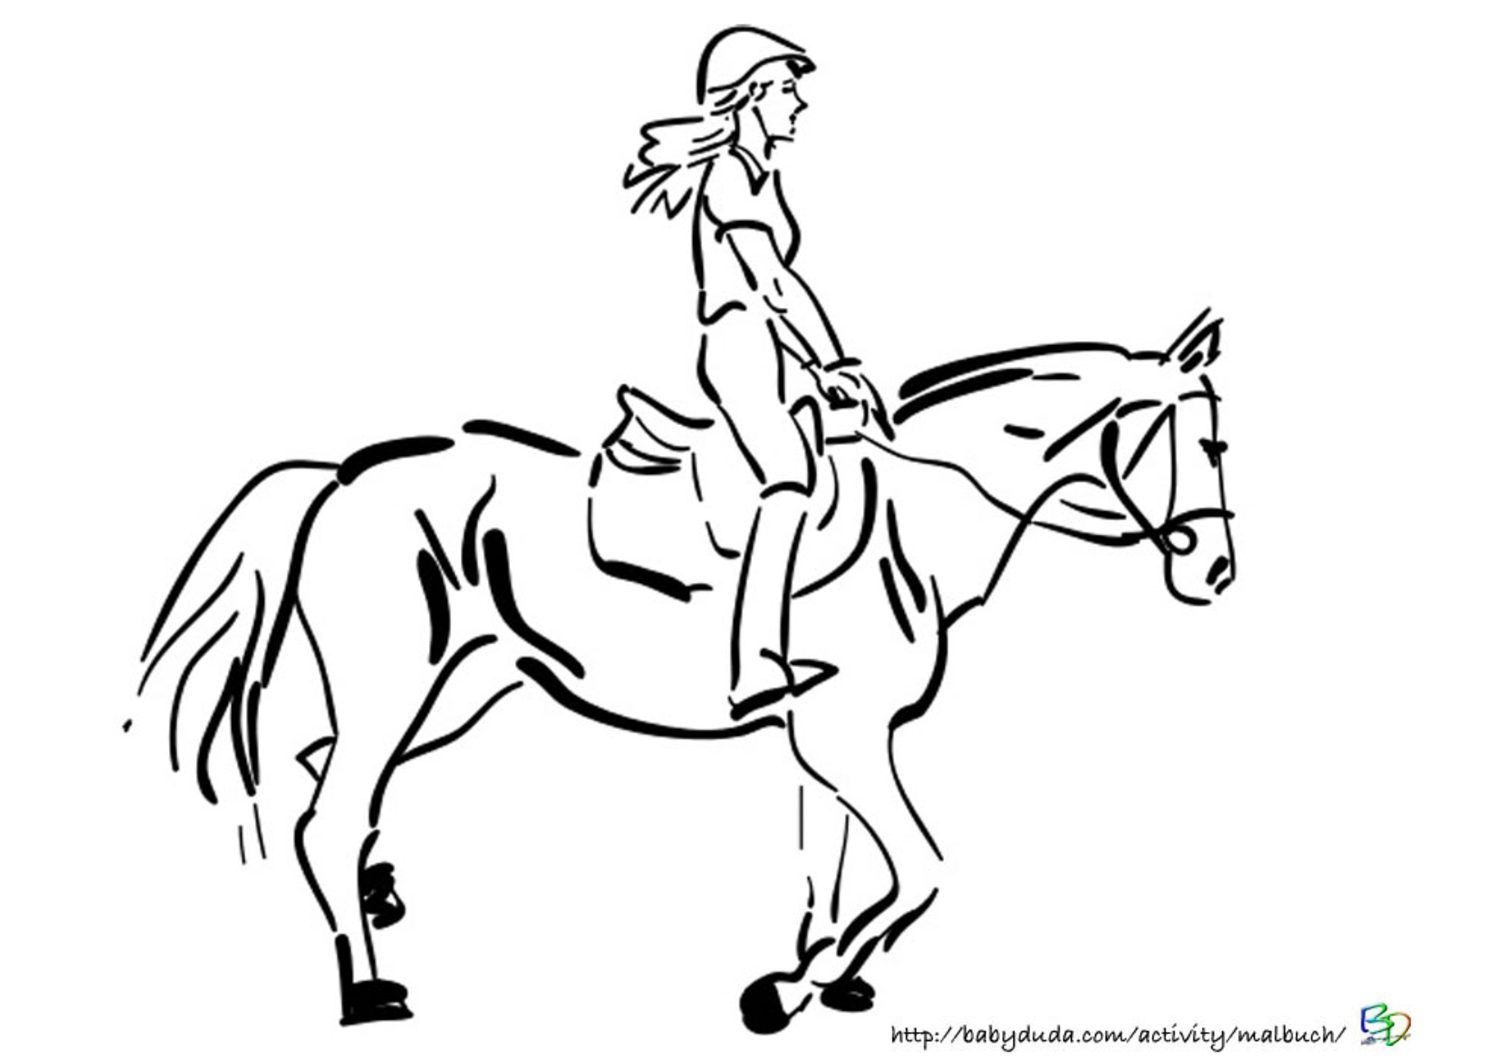 Pferdebilder Ausmalen Pferdek Pfe Ausmalbilder Ausmalbilder